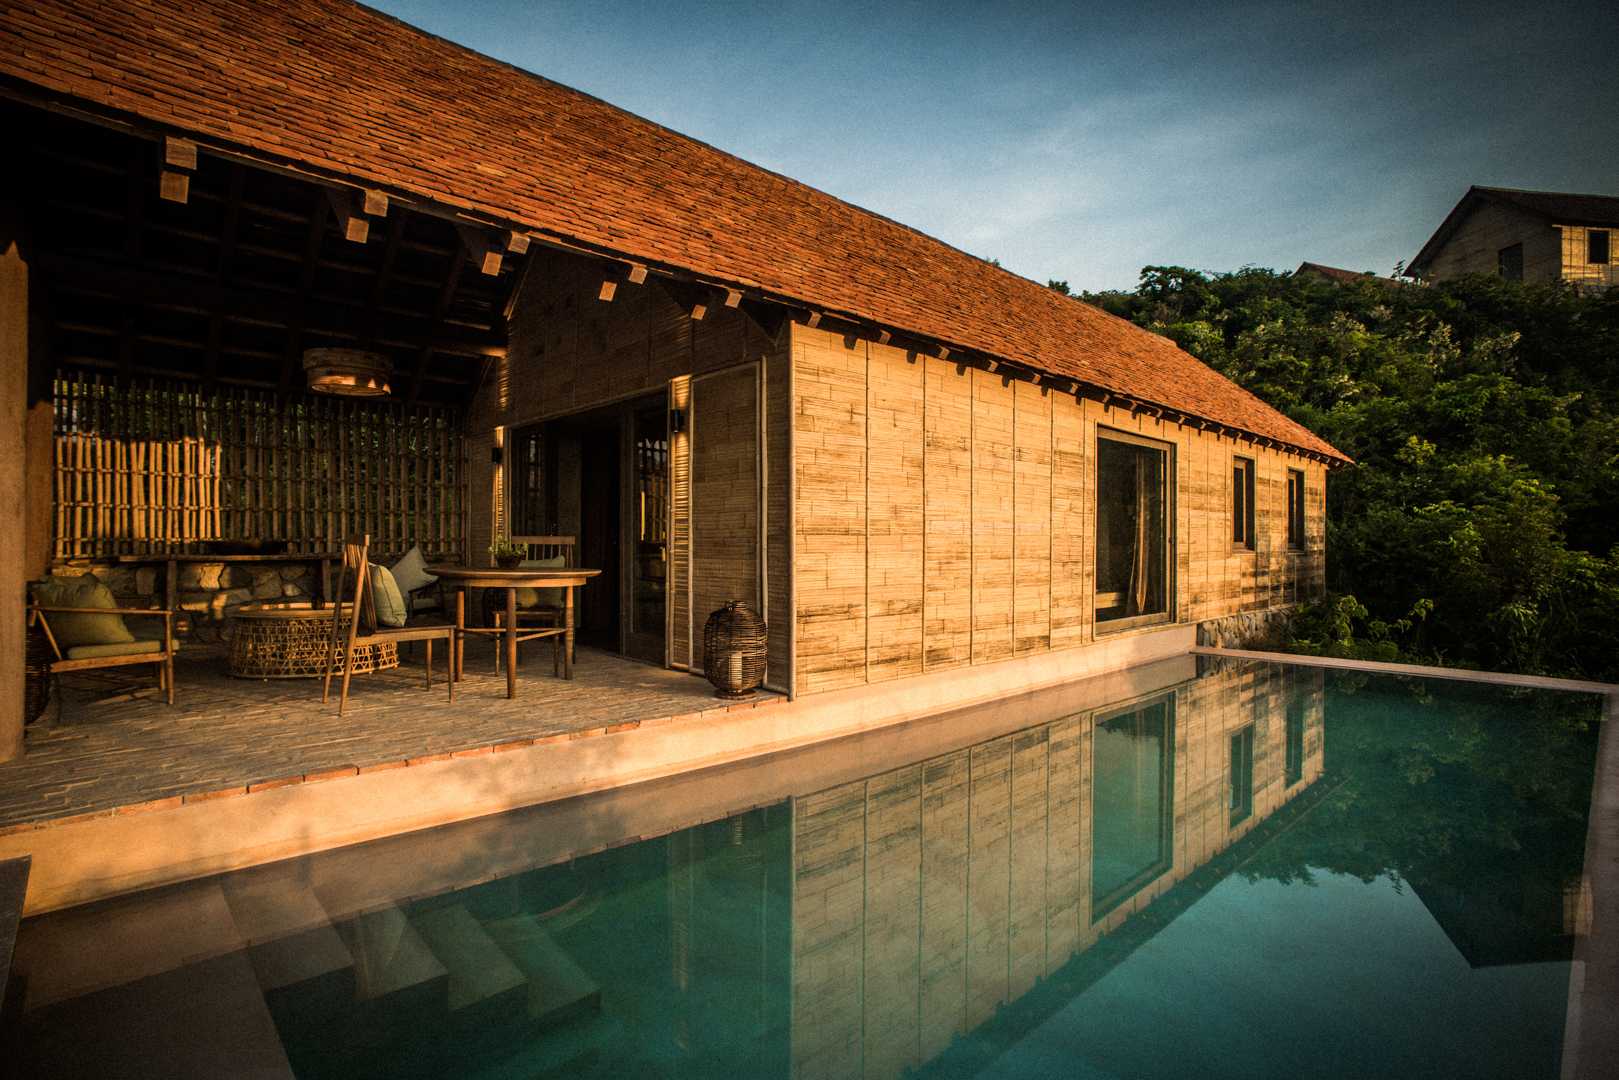 Zannier-Hotels-Bãi-San-Hô-Hill-Pool-Villa-Exterior-2-©-Frederik-Wissink-for-Zannier-Hotels